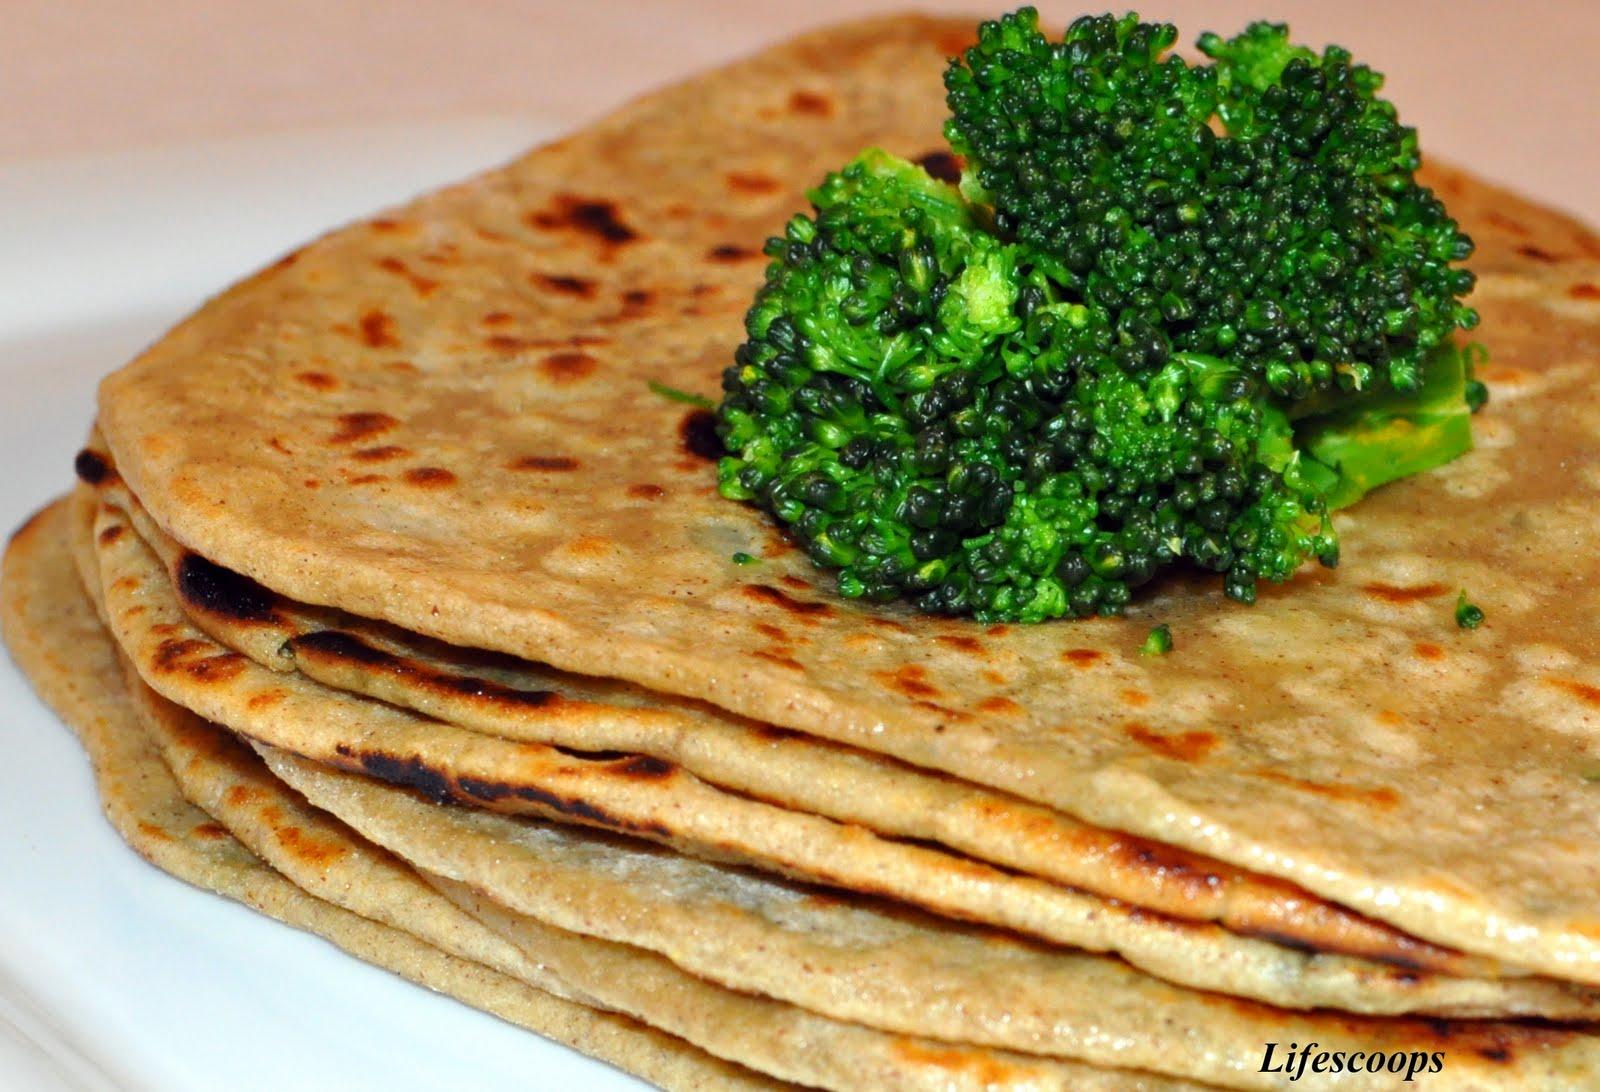 ... Broccoli Aloo Paratha (Broccoli and Potato stuffed Indian Flatbread